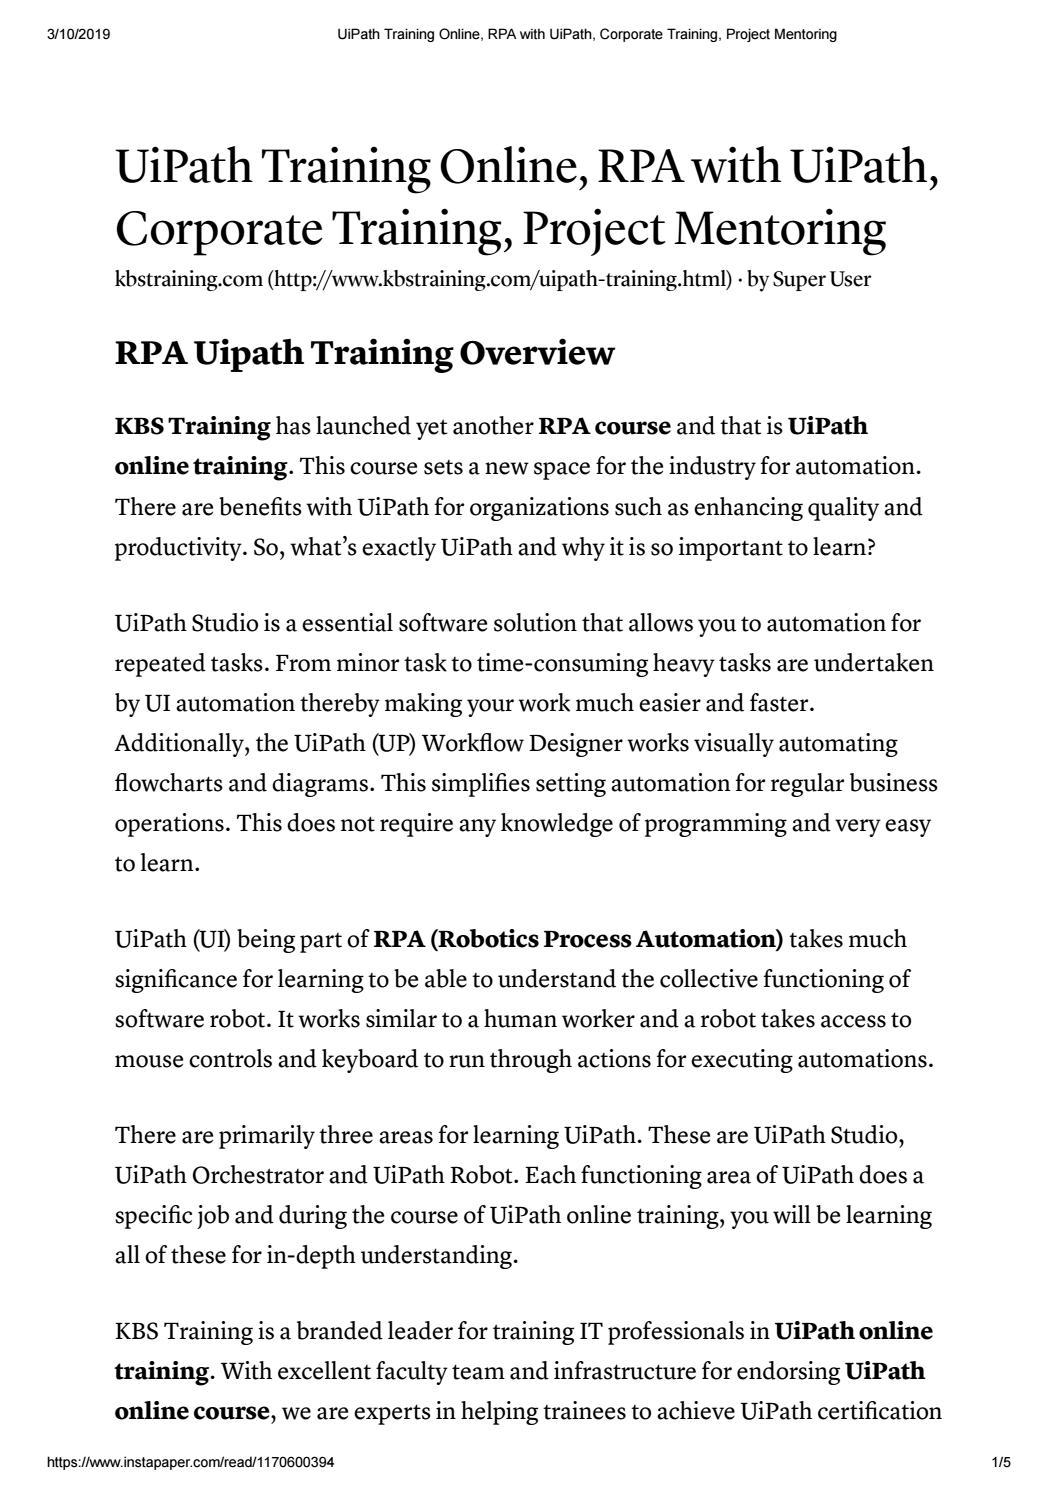 UiPath Training | UiPath Online Training - KBS Training